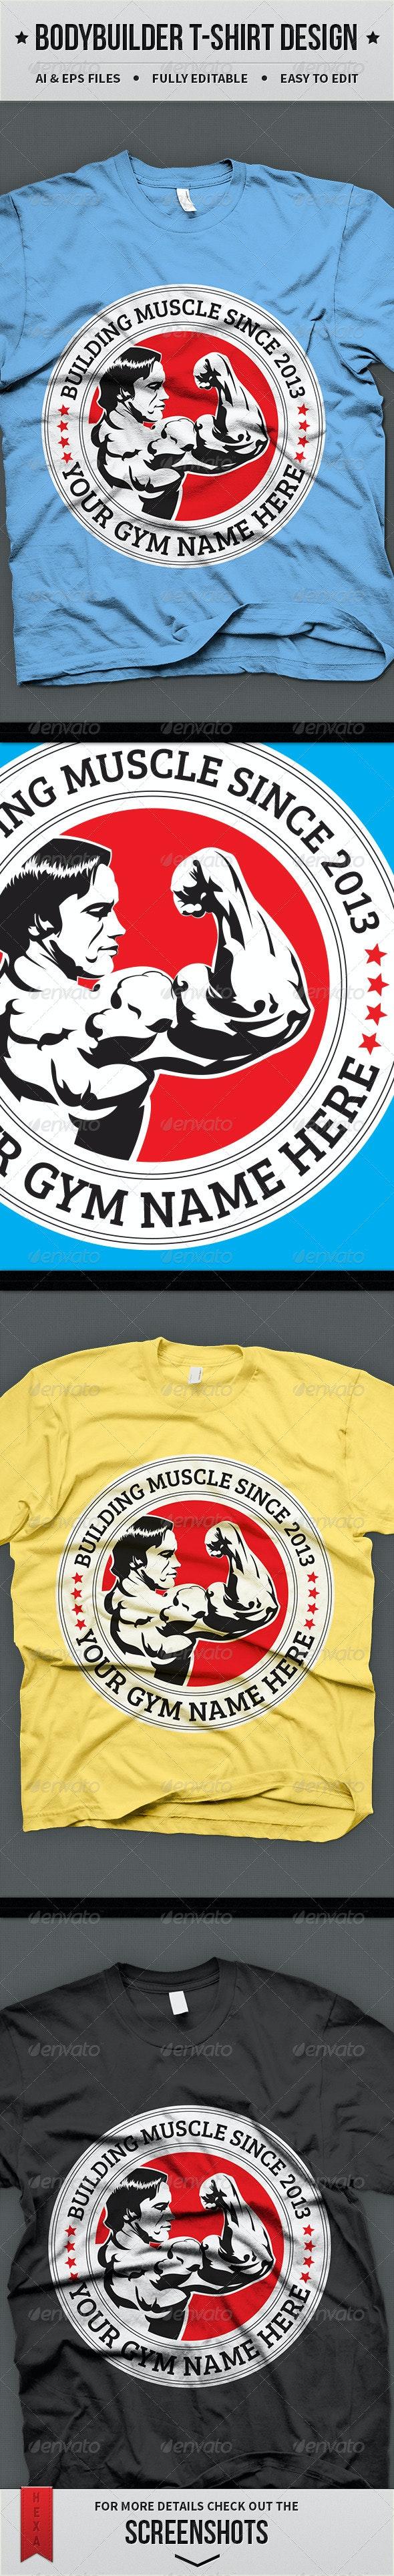 Bodybuilder T-shirt Design - Sports & Teams T-Shirts